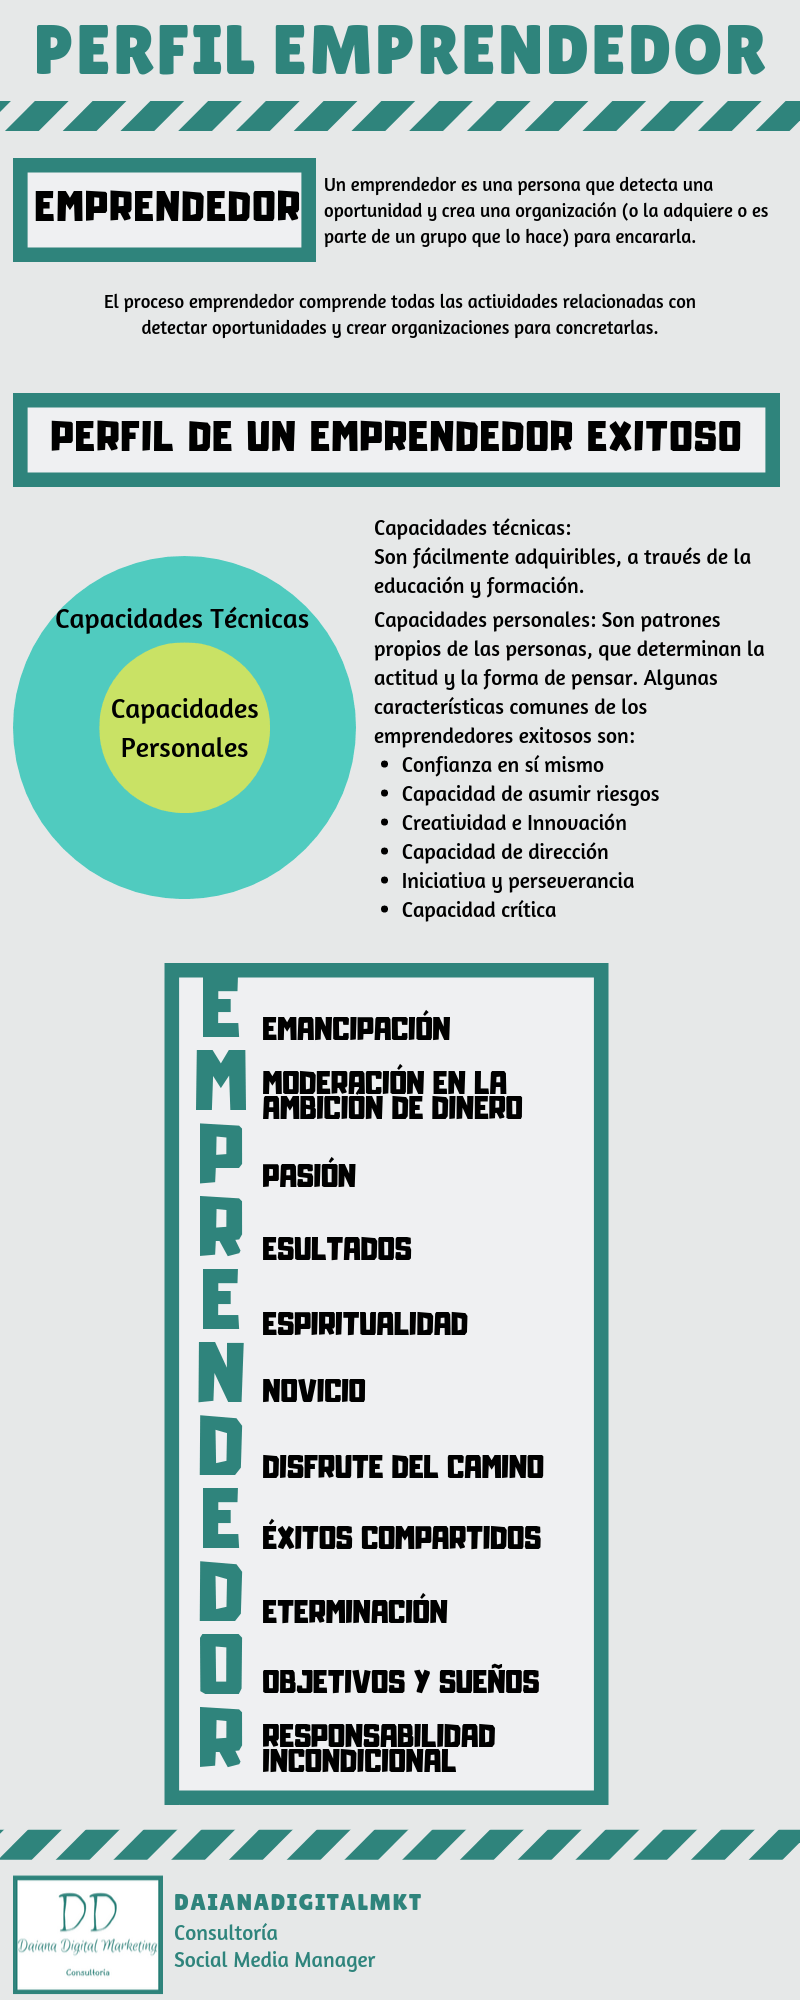 Pin De Biblioteca Liceo Salvador Umañ En Emprendedores Como Ser Emprendedor Emprendedores Exitosos Emprendedor